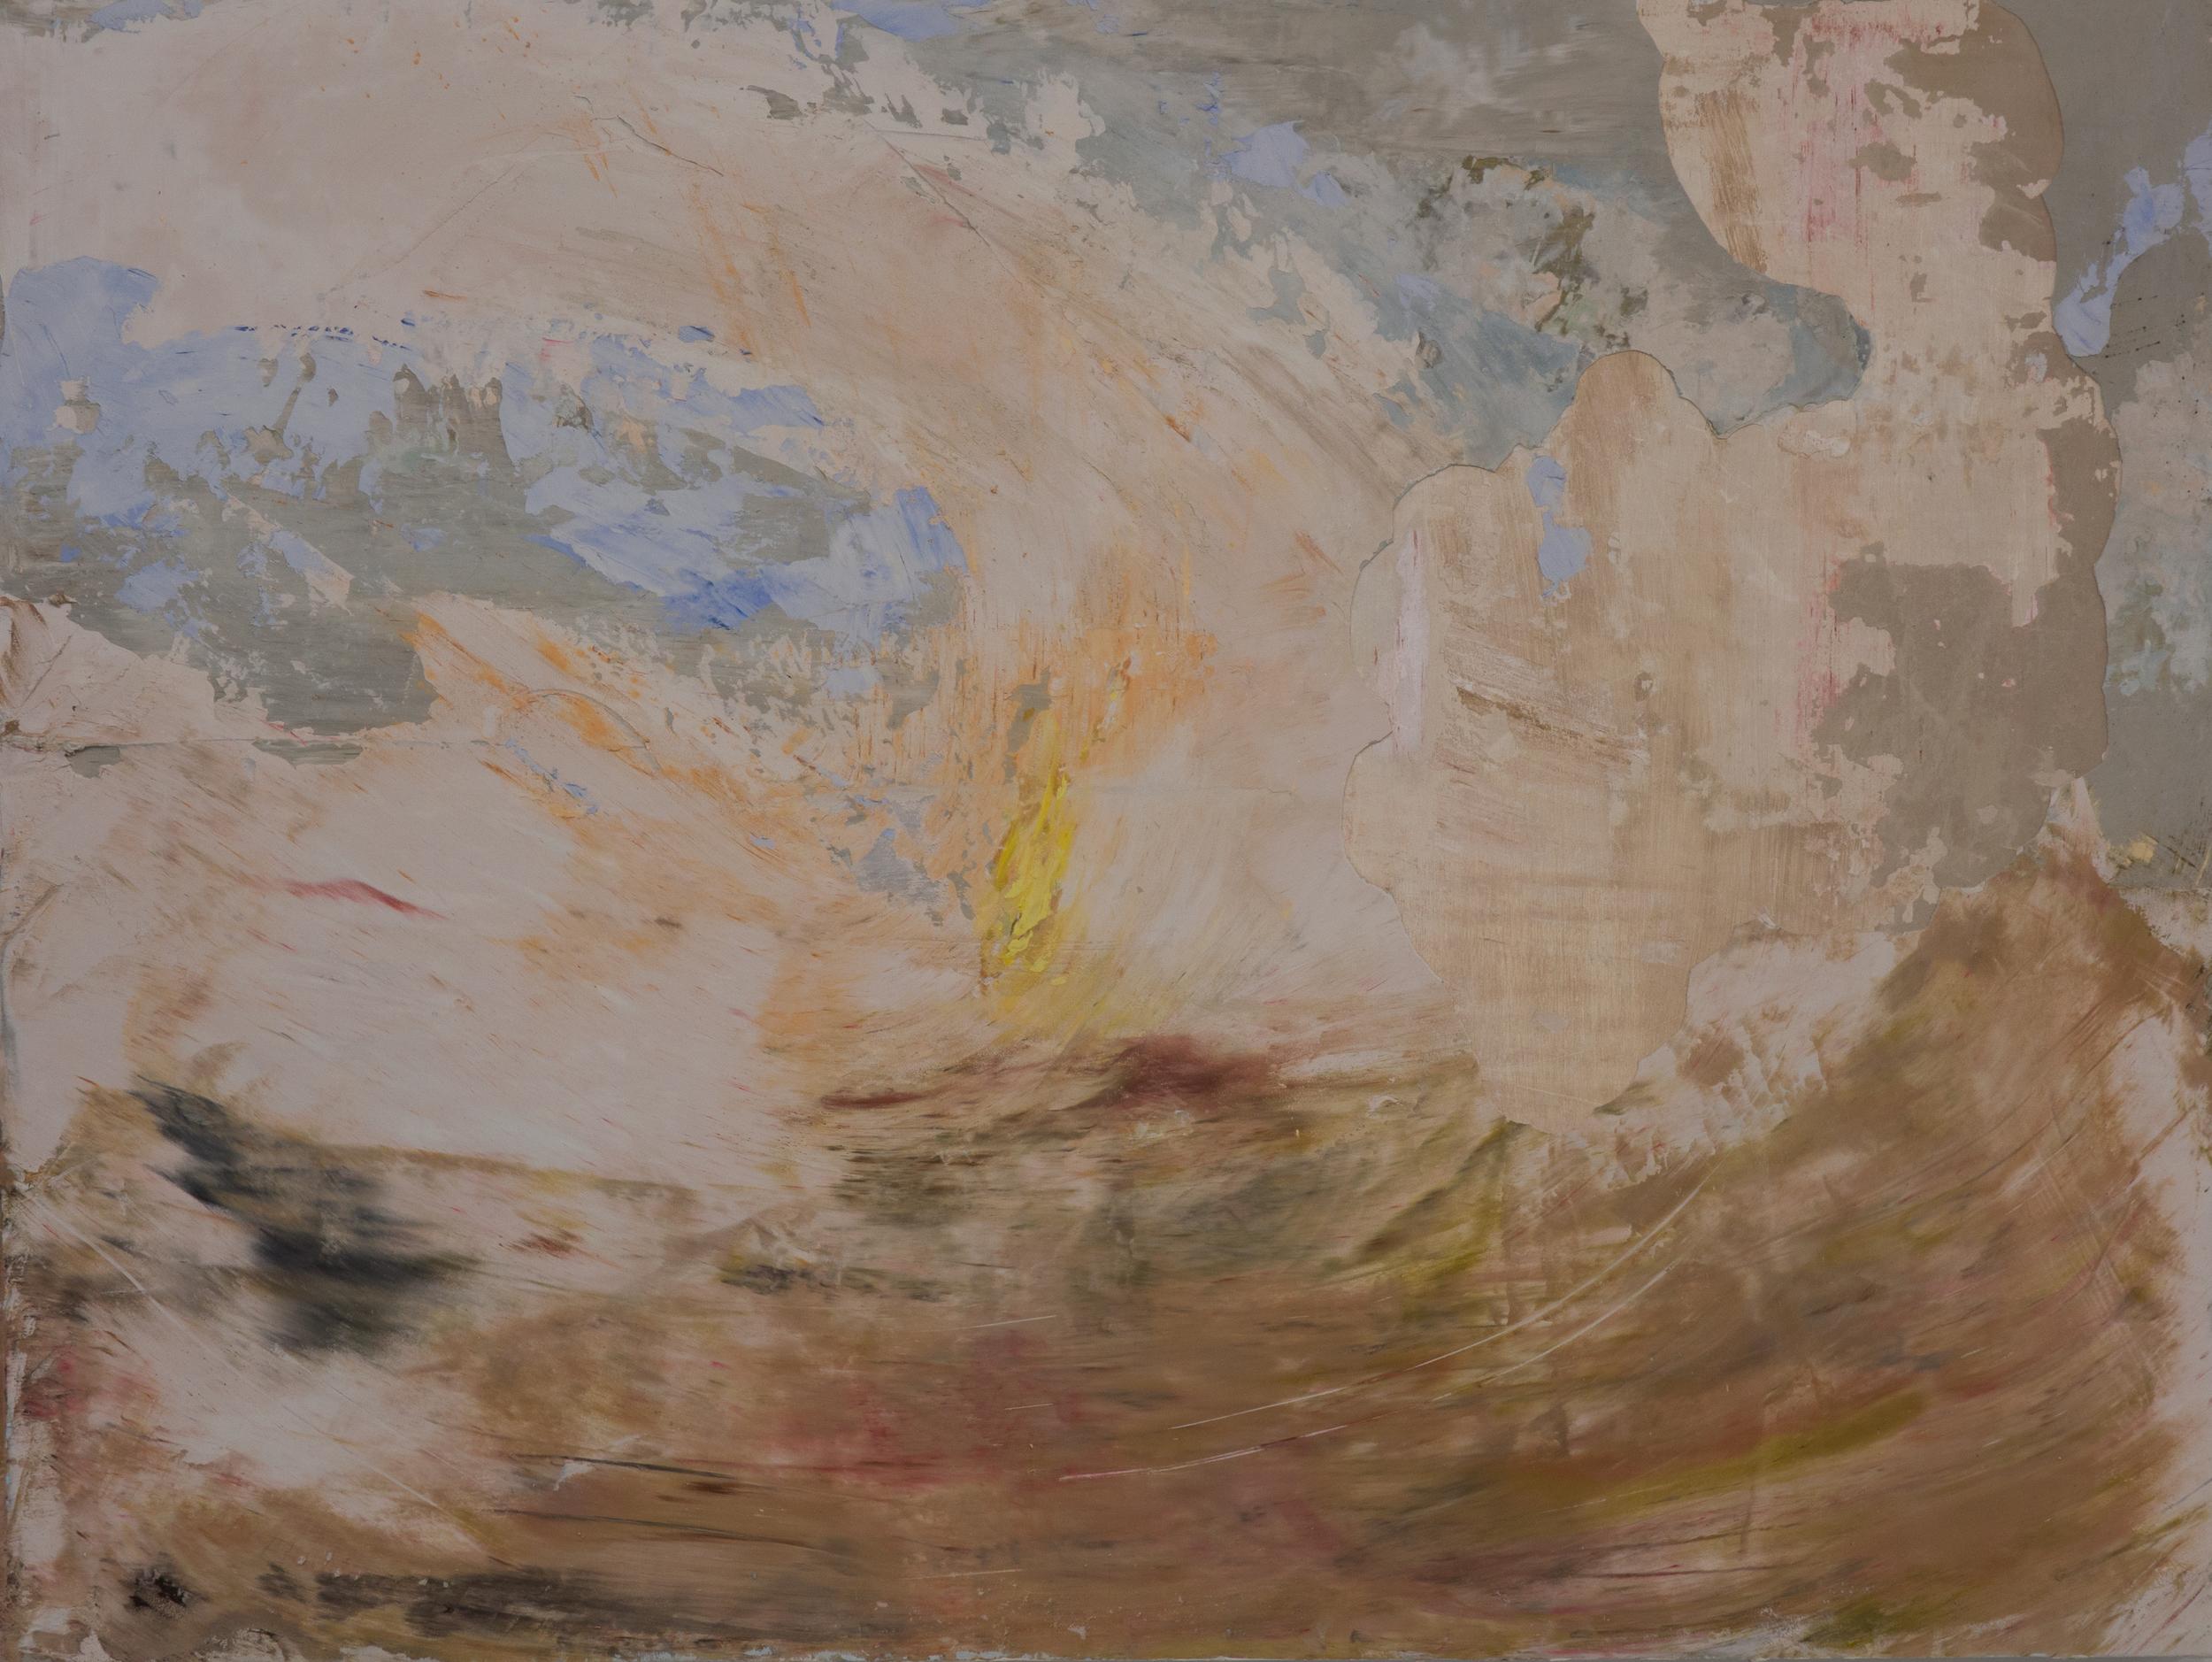 SV-051, Shelley Vanderbyl, Signal Fire (Day) , 2016, Fresco on Panel, 30x40